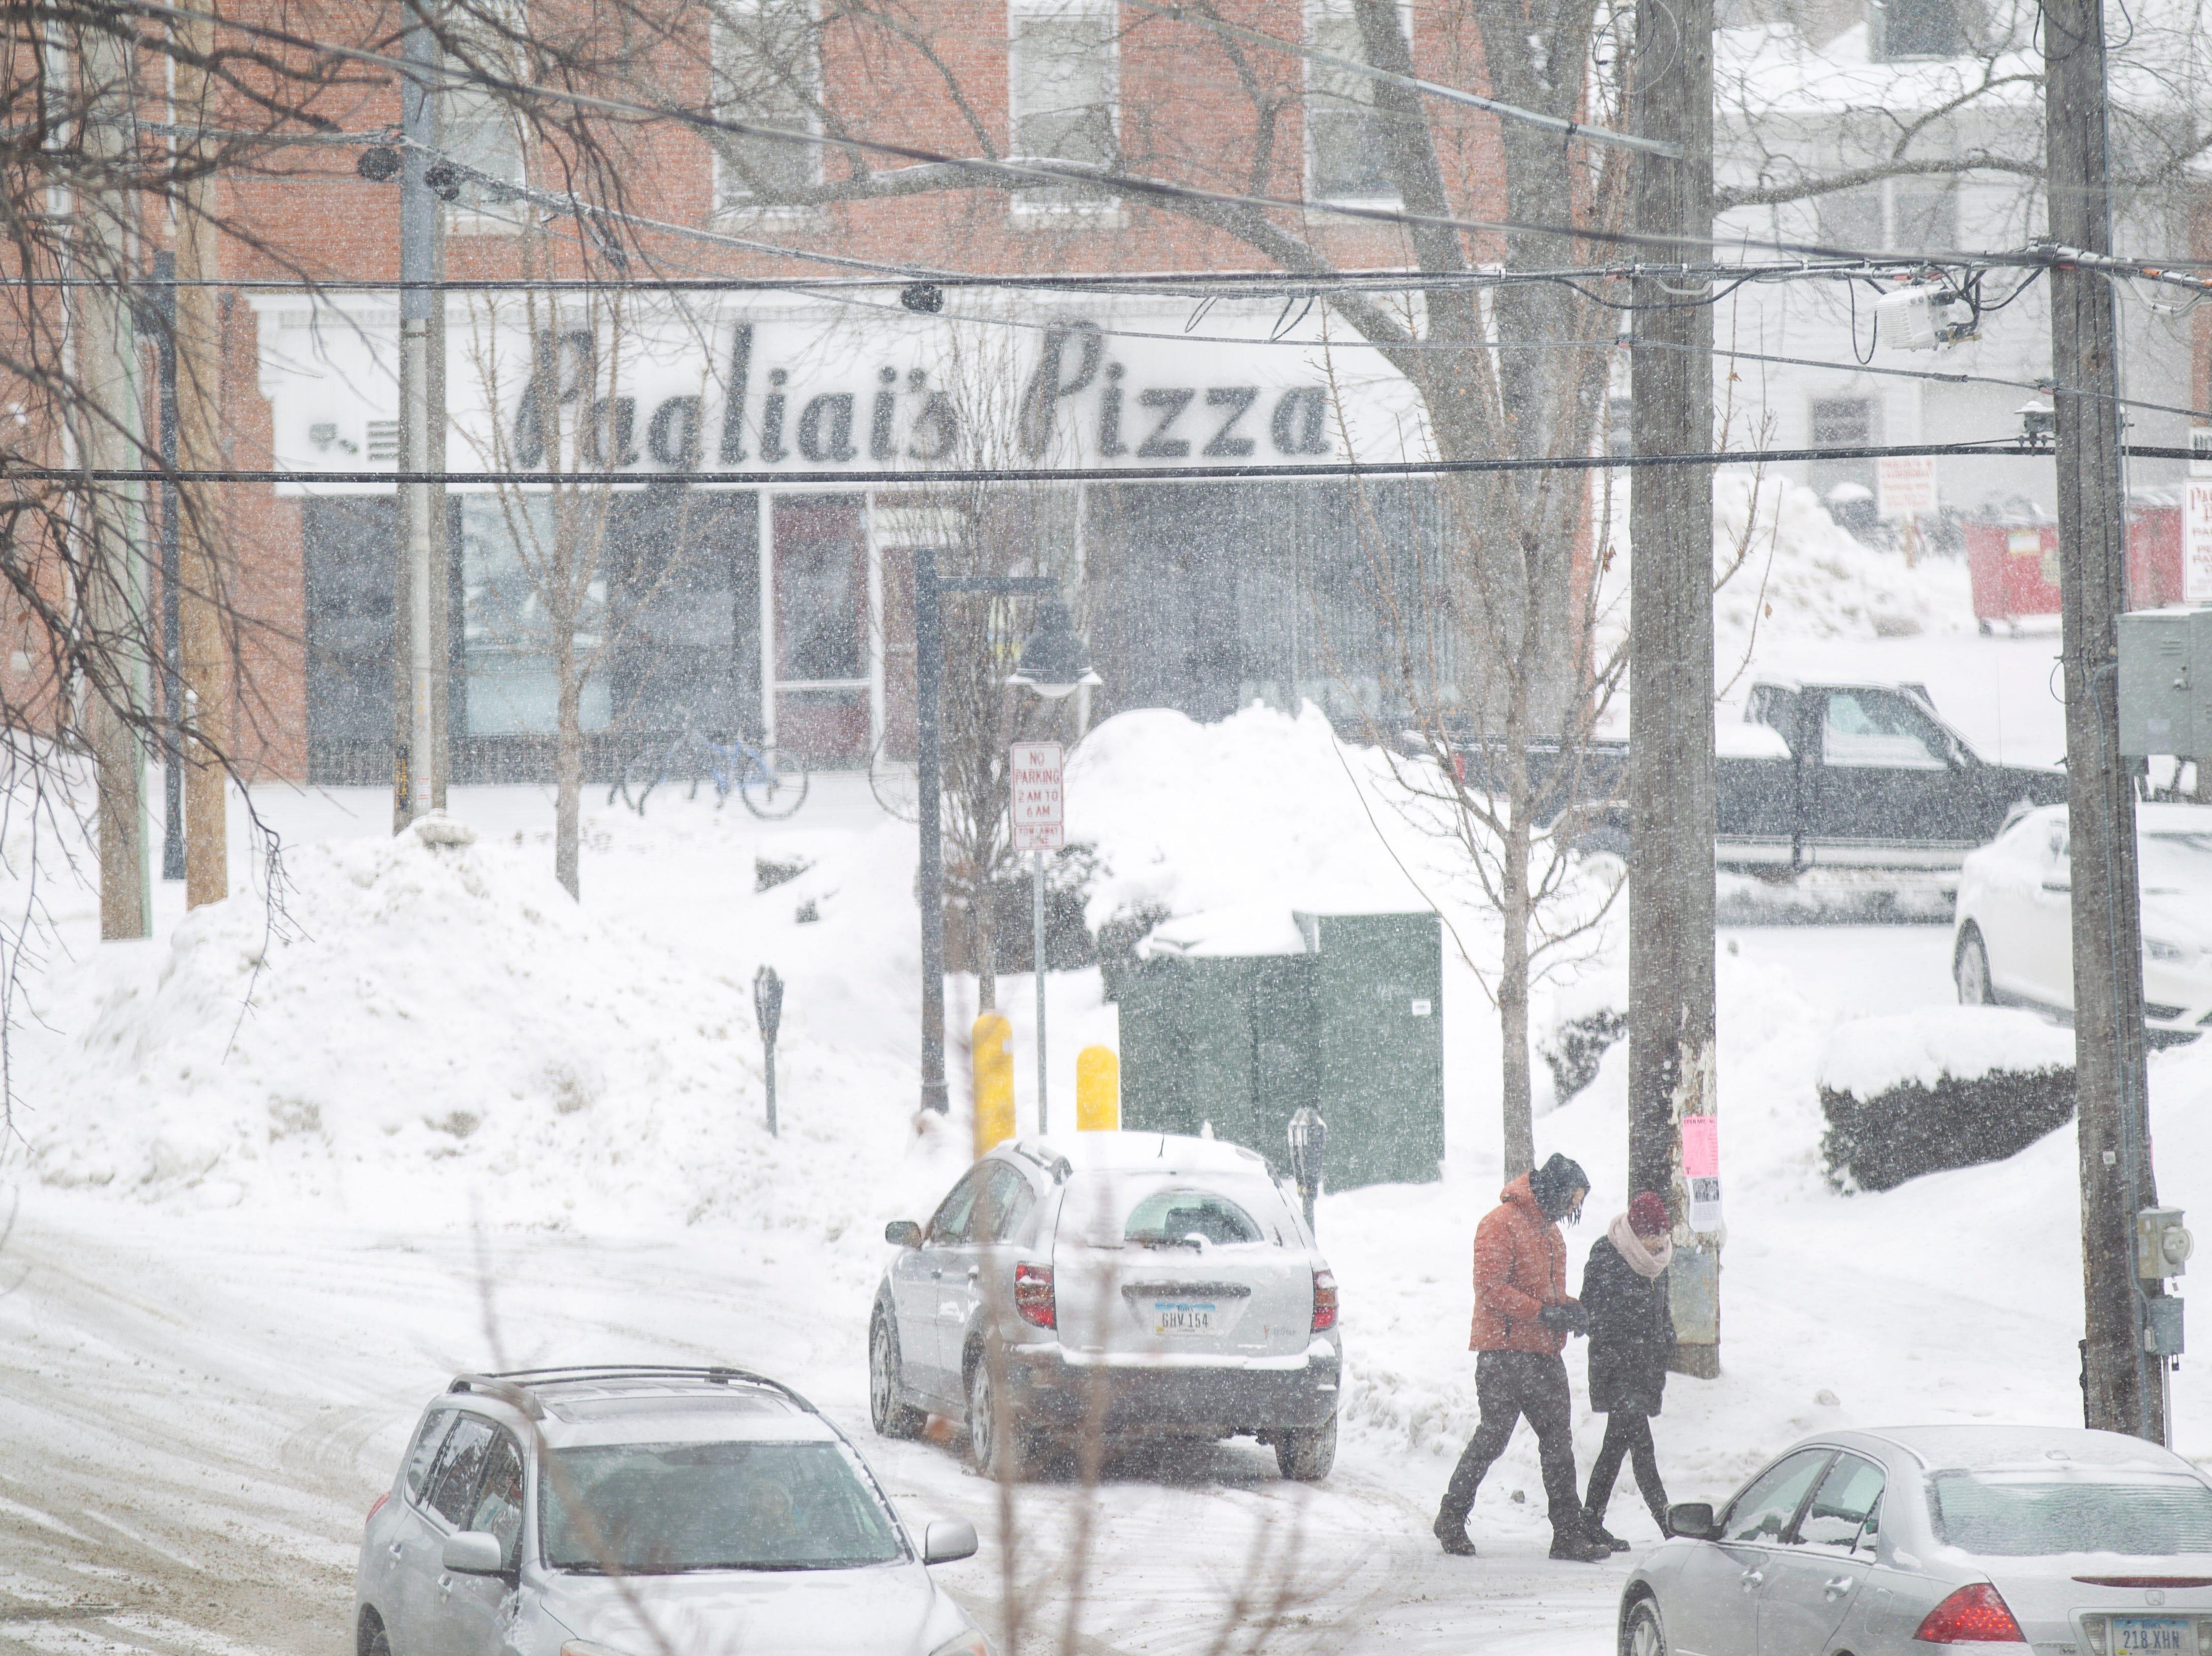 People walk as snow falls on Thursday, Jan. 31, 2019, in downtown Iowa City, Iowa.